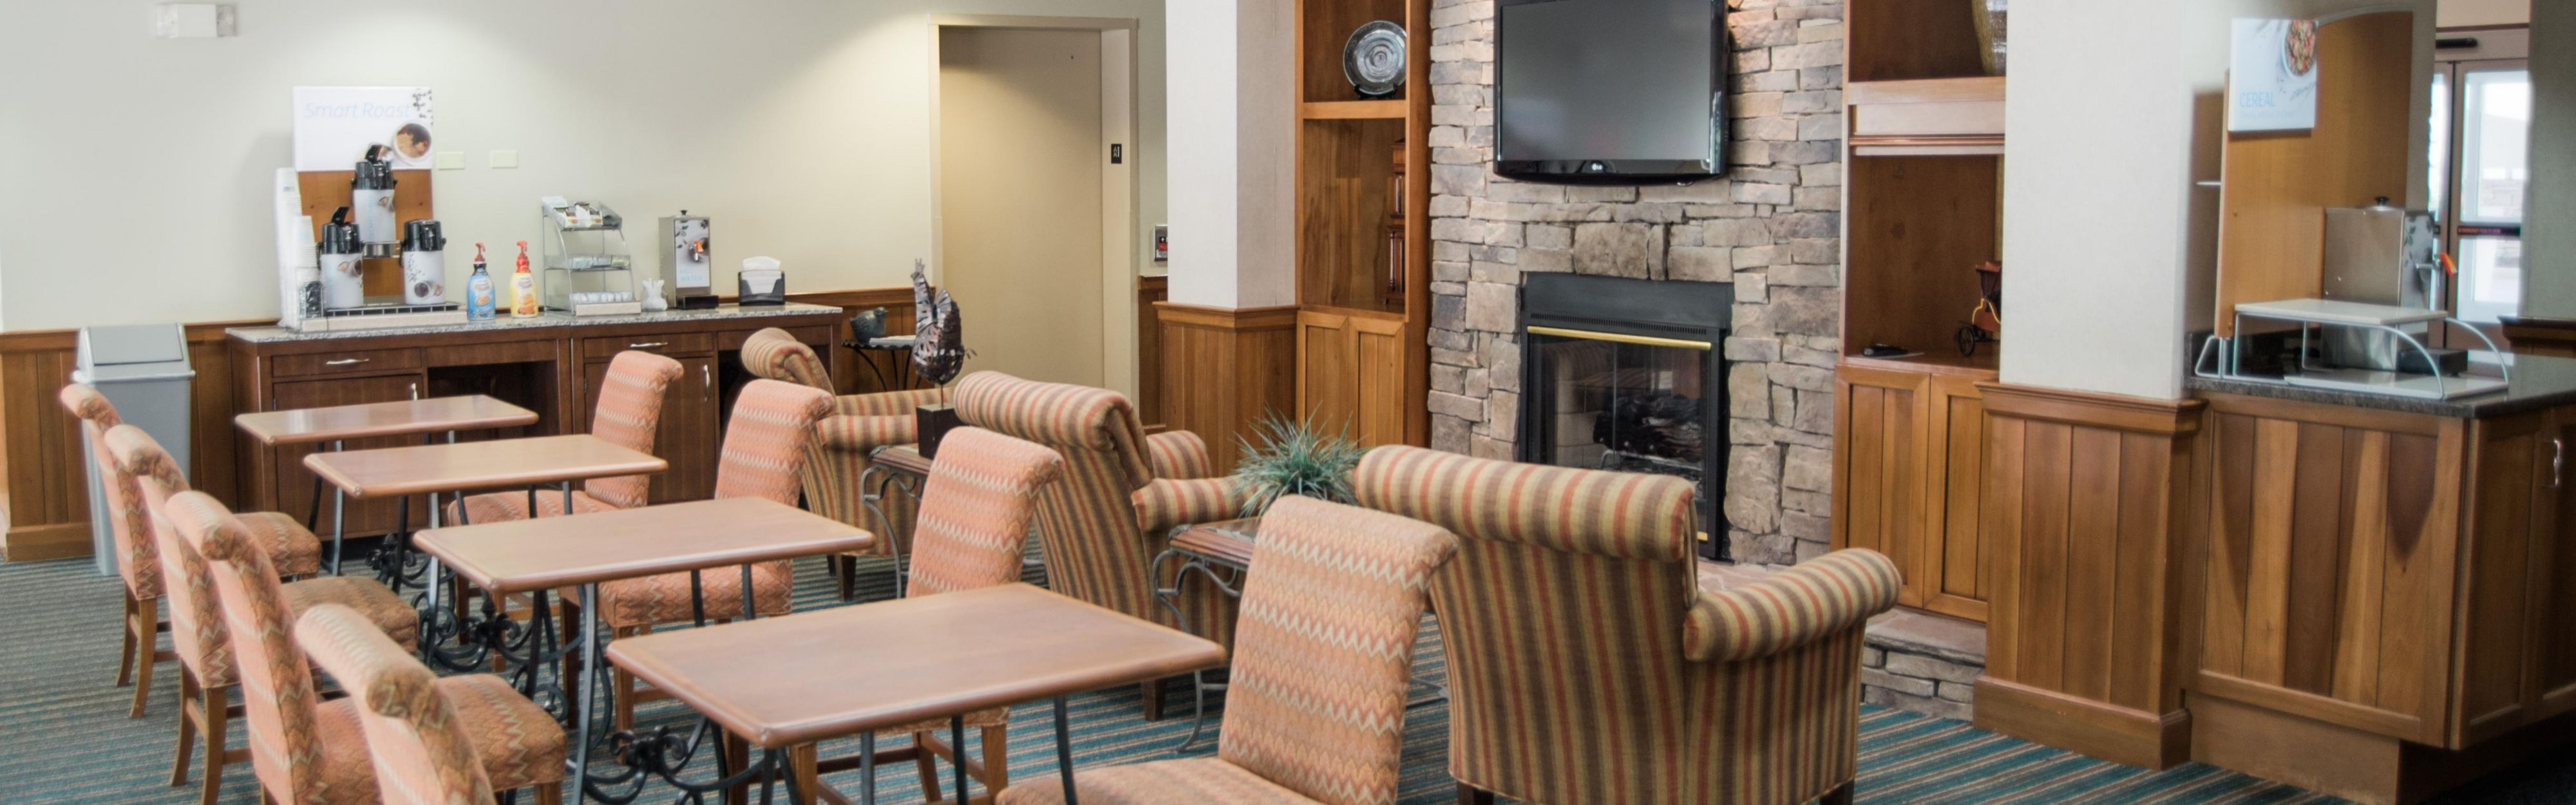 Holiday Inn Express Conover (Hickory Area) image 3